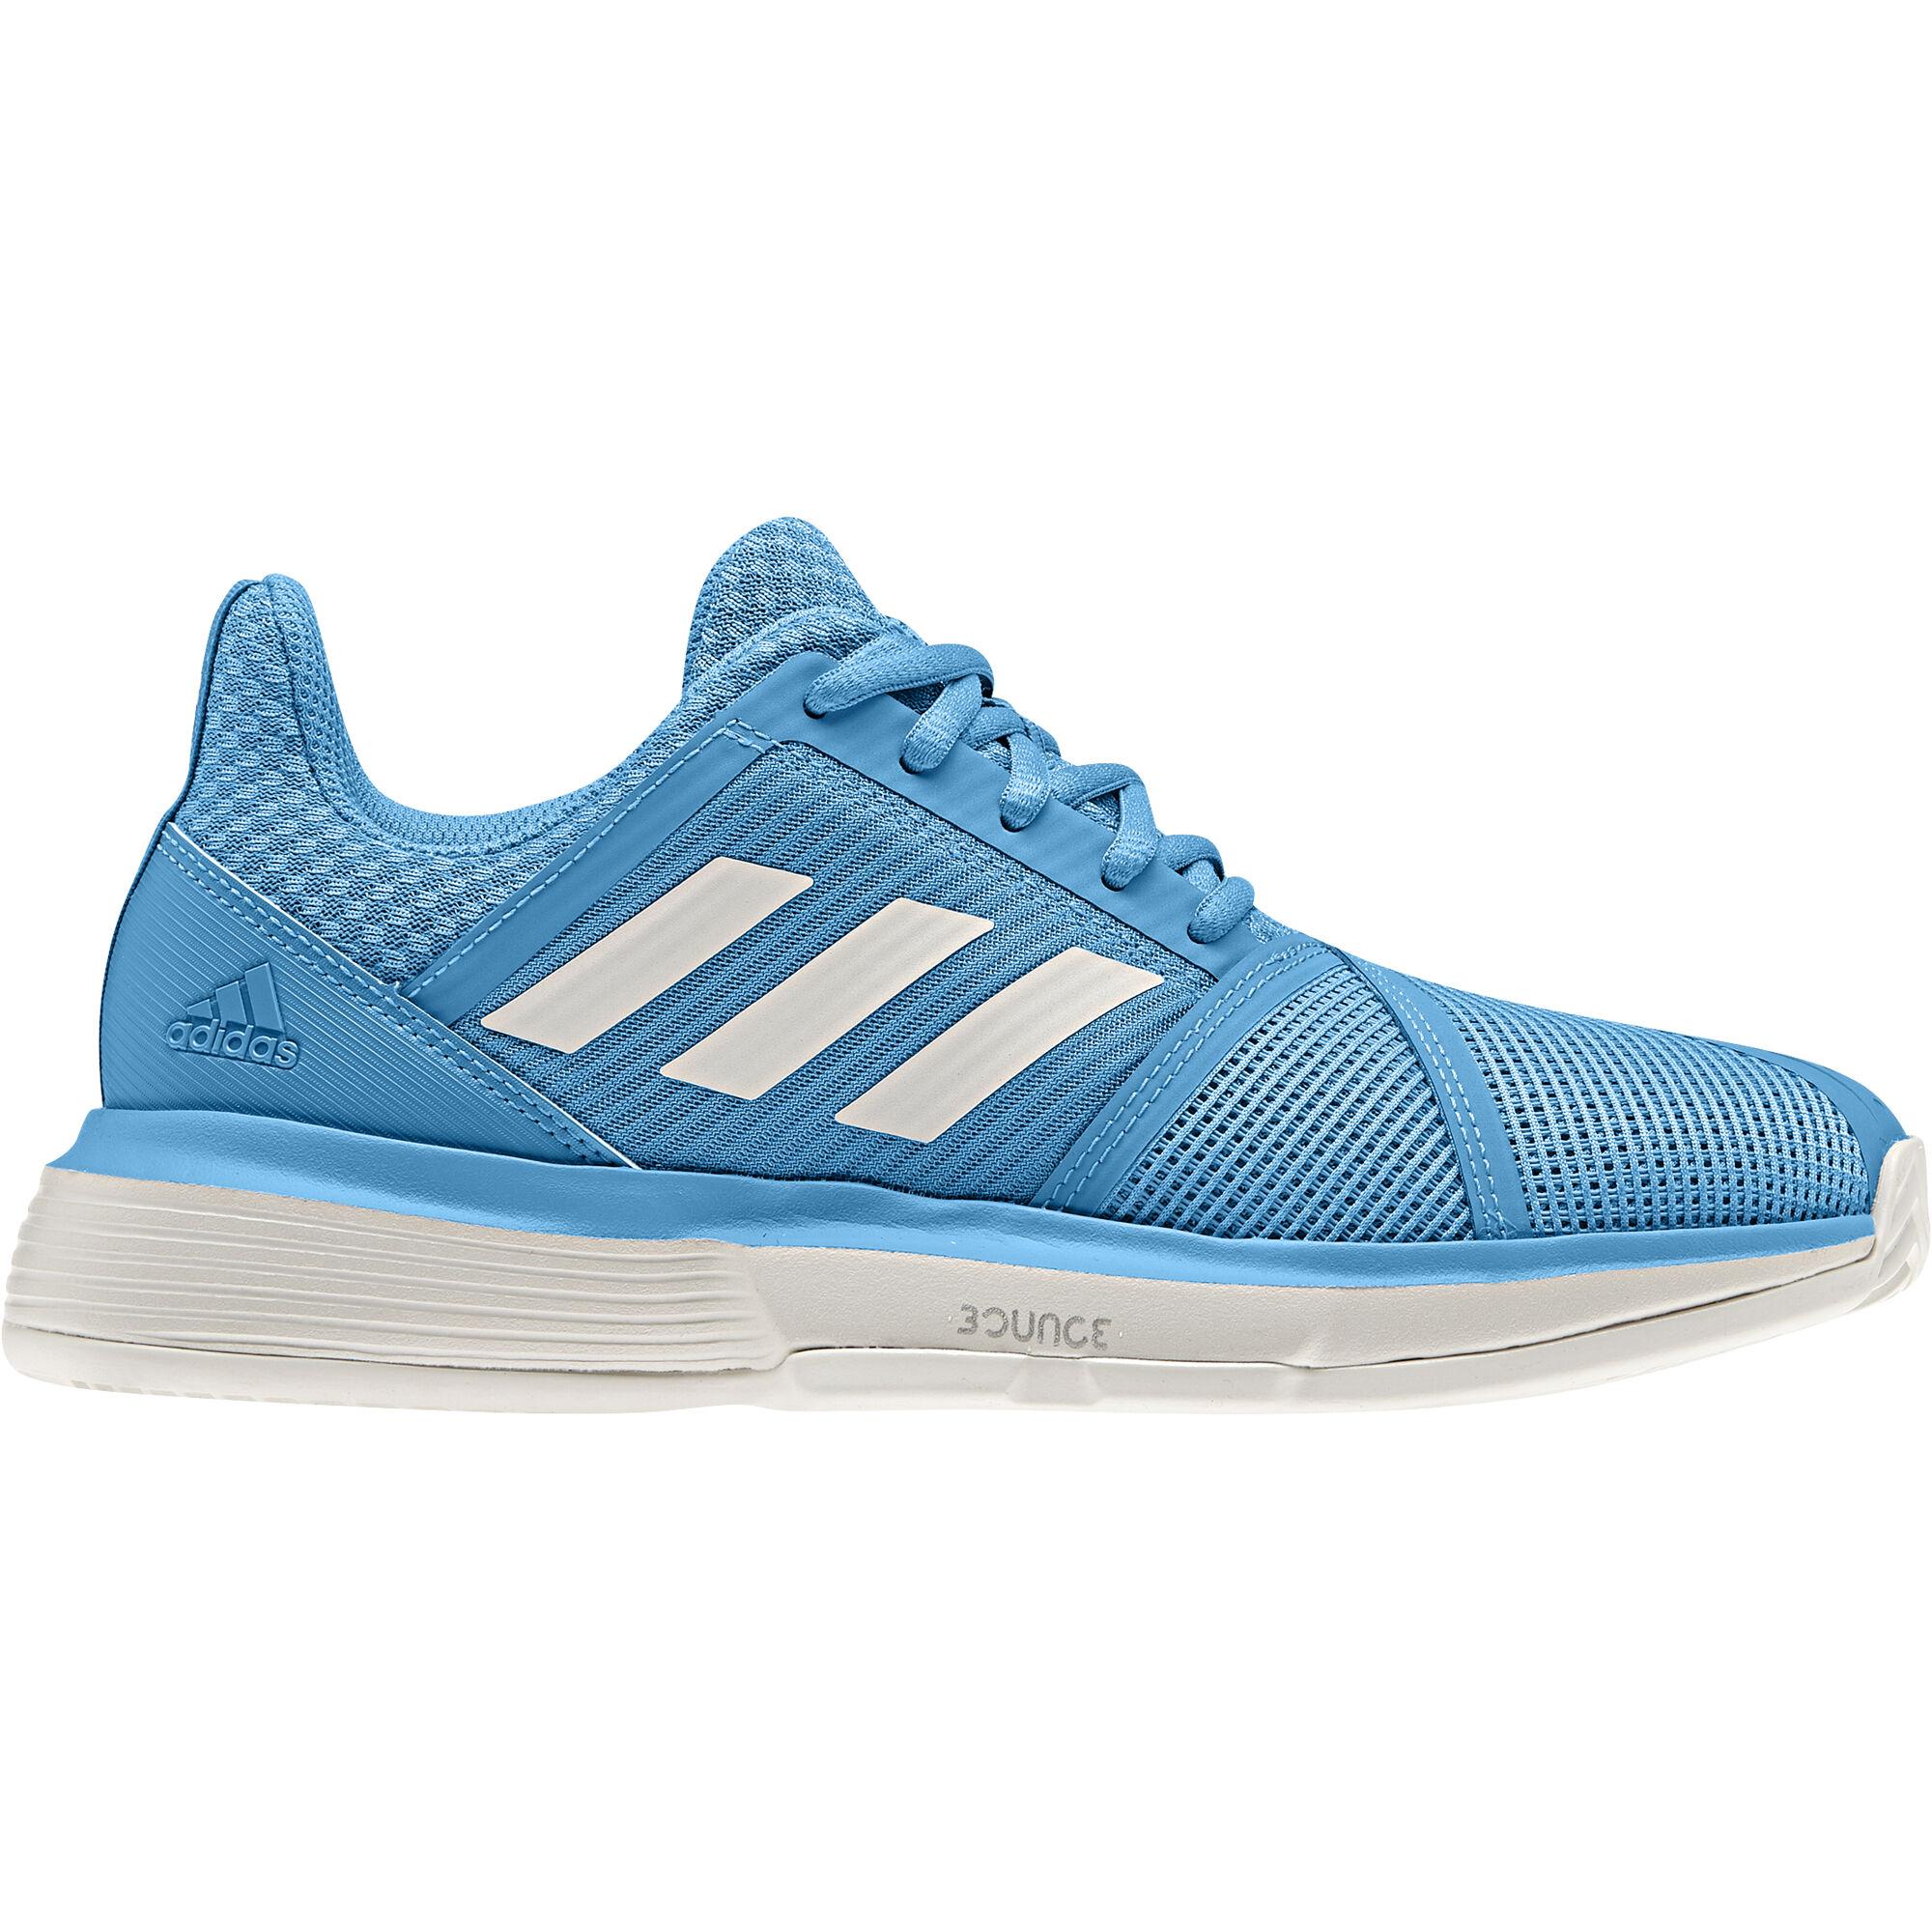 adidas Court Jam Bounce Clay Sandplatzschuh Damen - Hellblau, Weiß